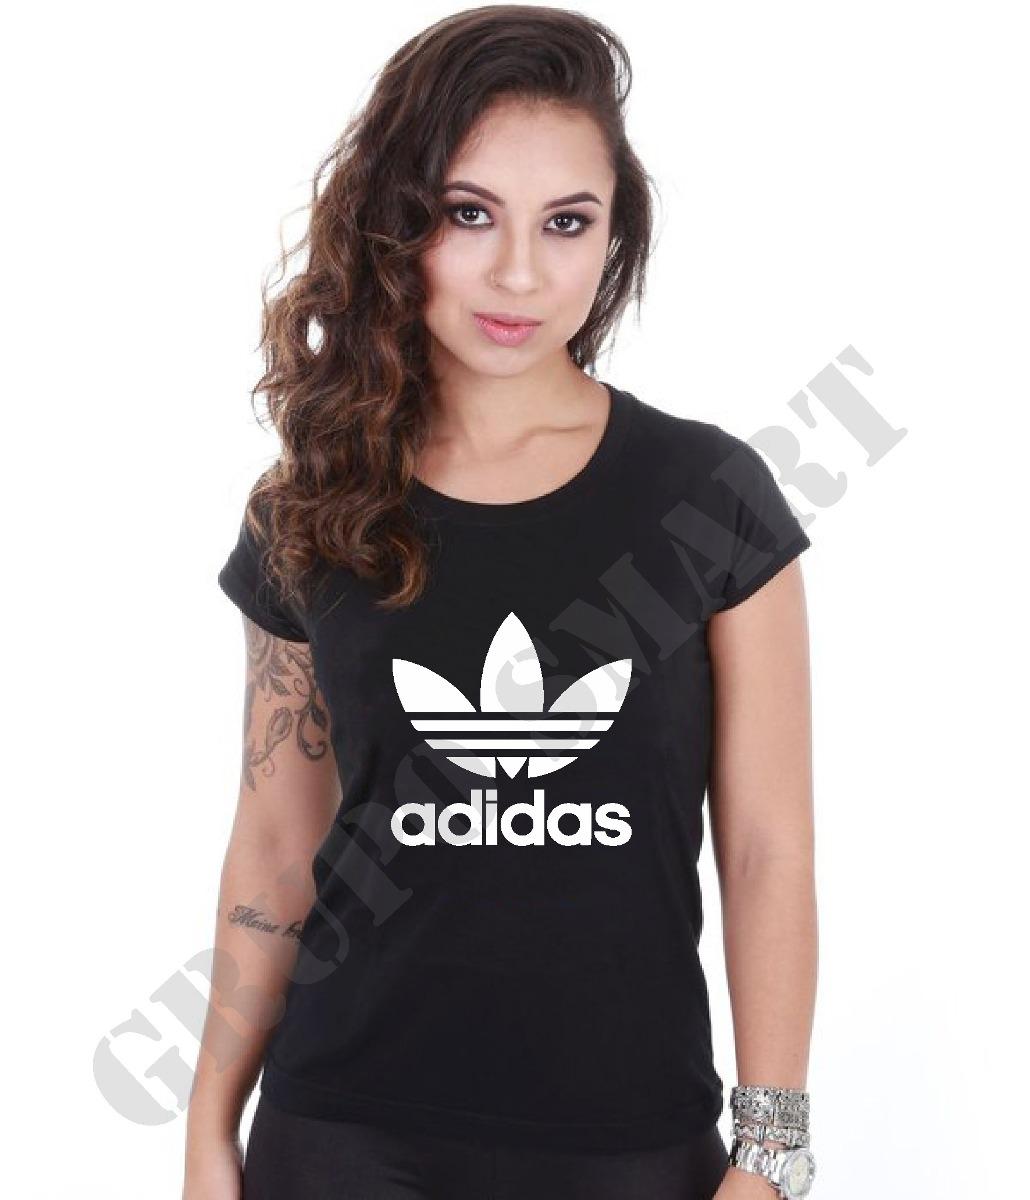 aafcff4b09acf camiseta camisa baby look feminina adidas personalizada. Carregando zoom.